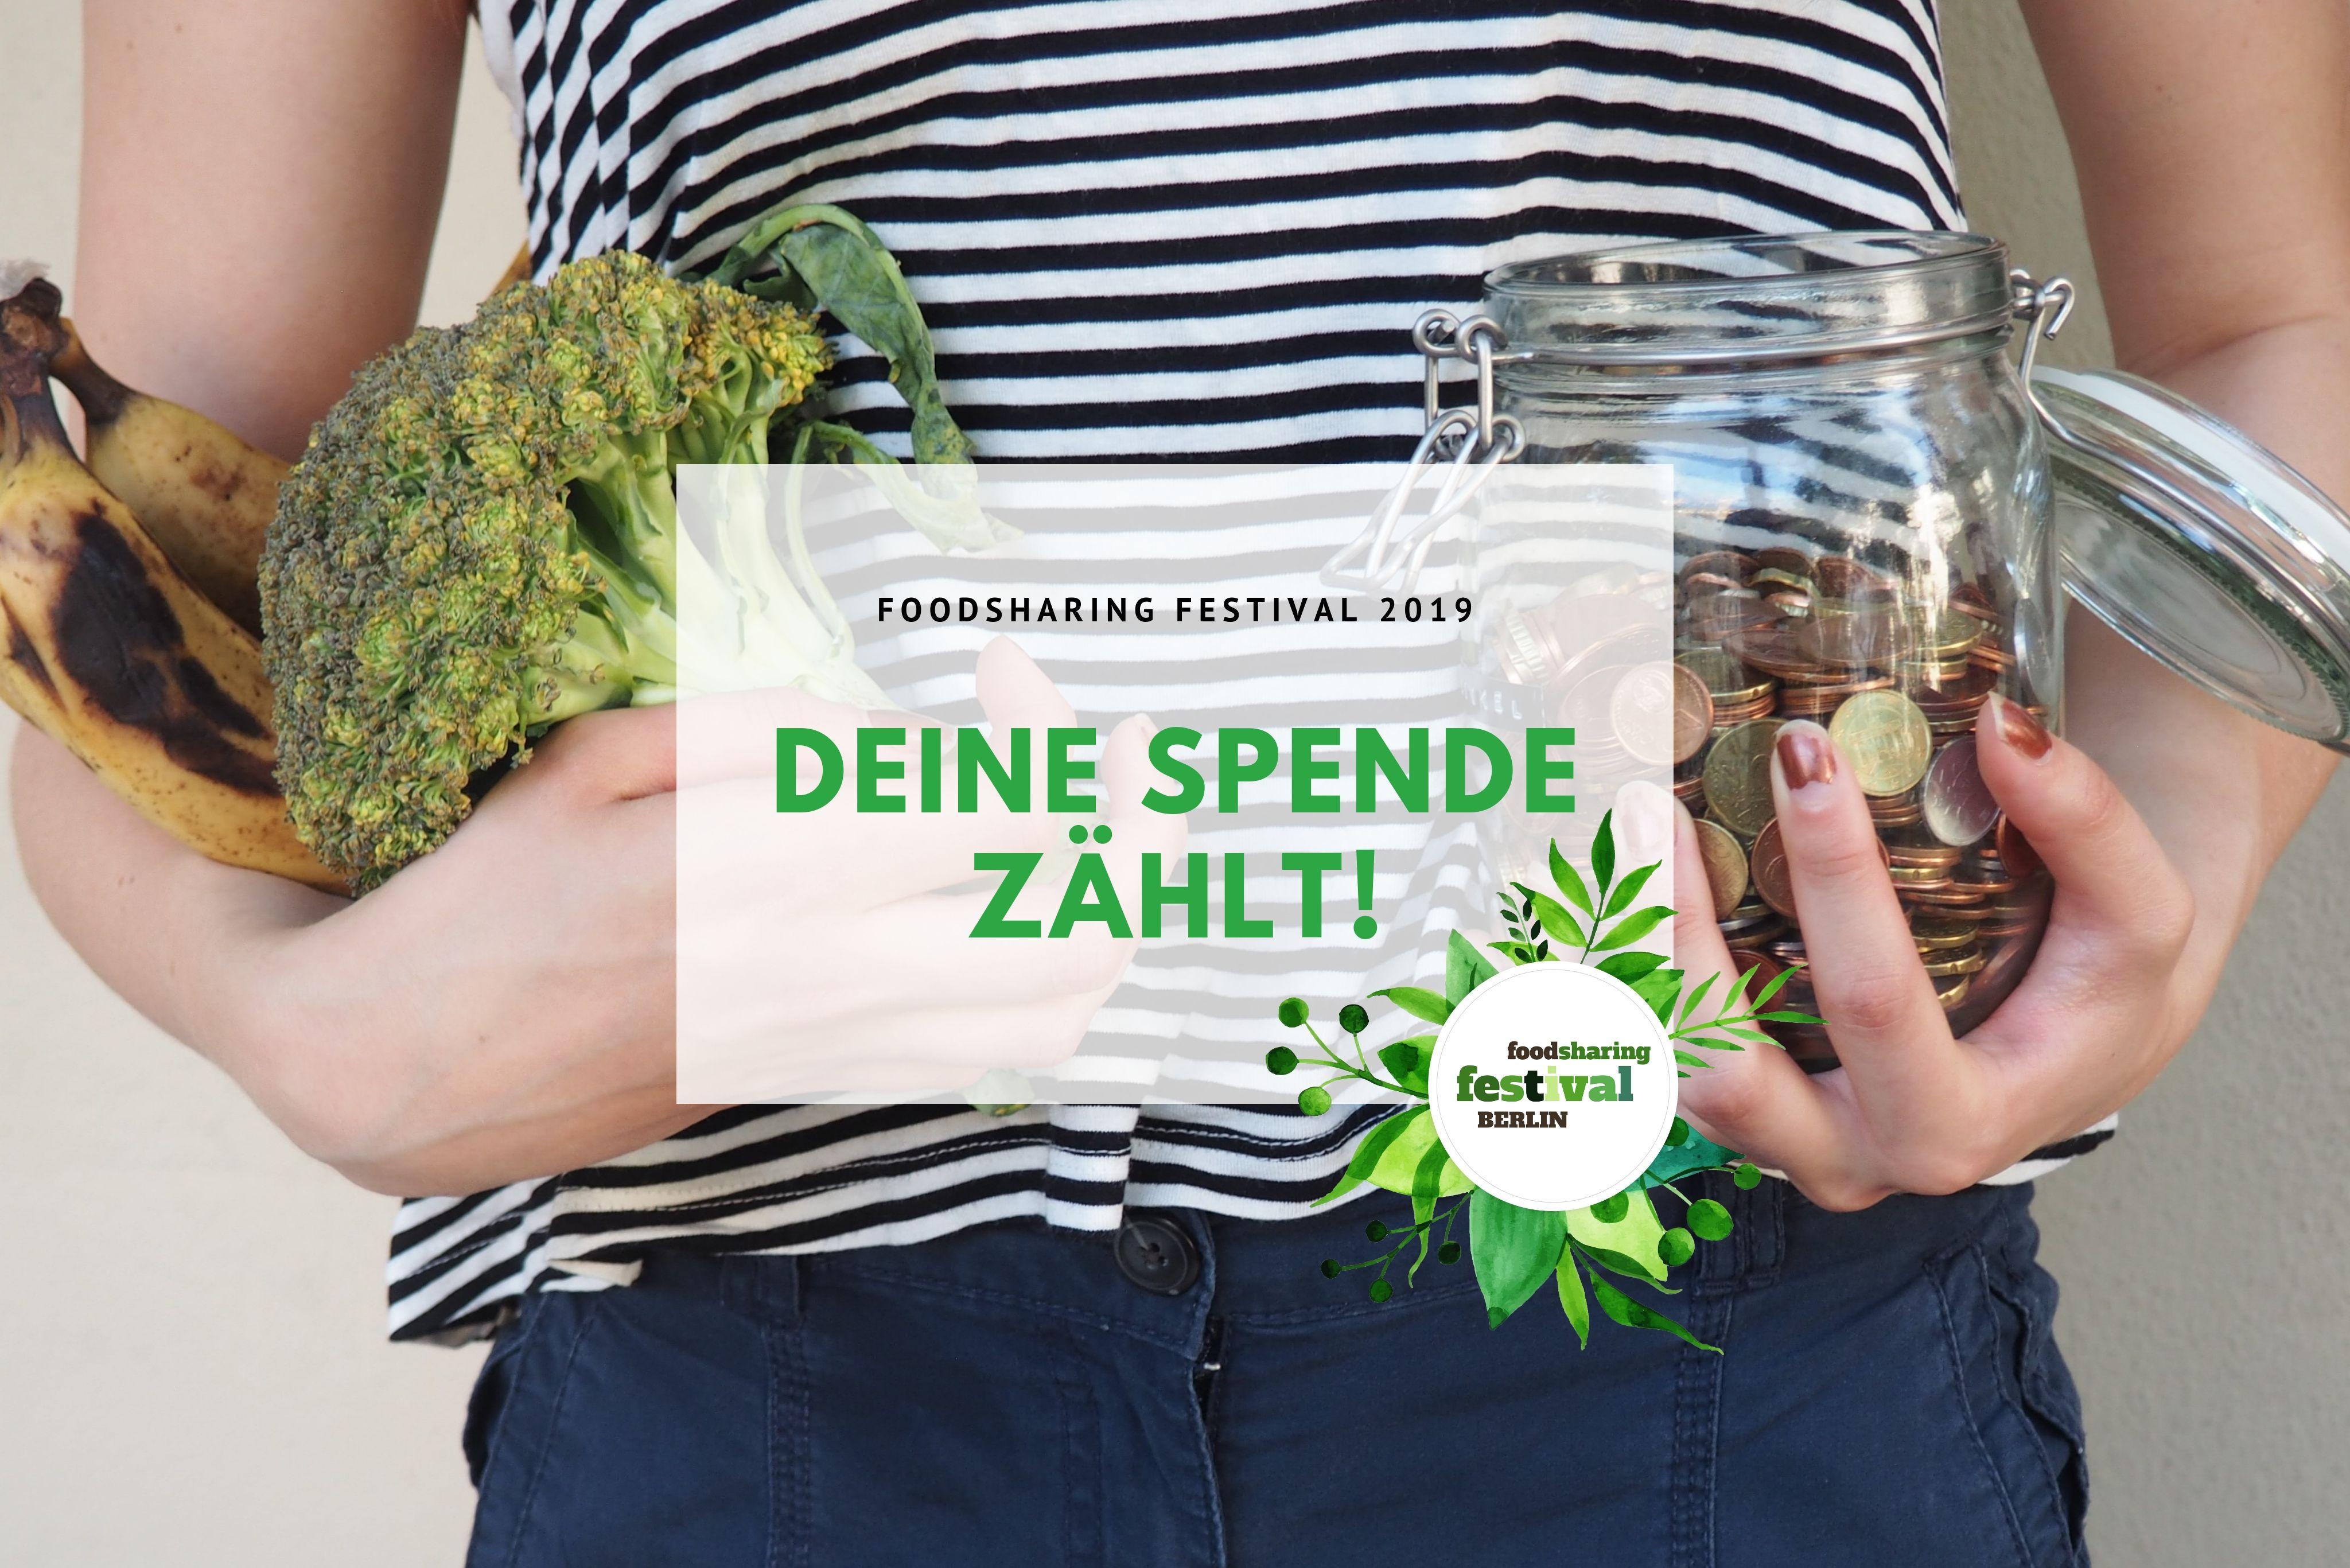 Foodsharing Festival 2019